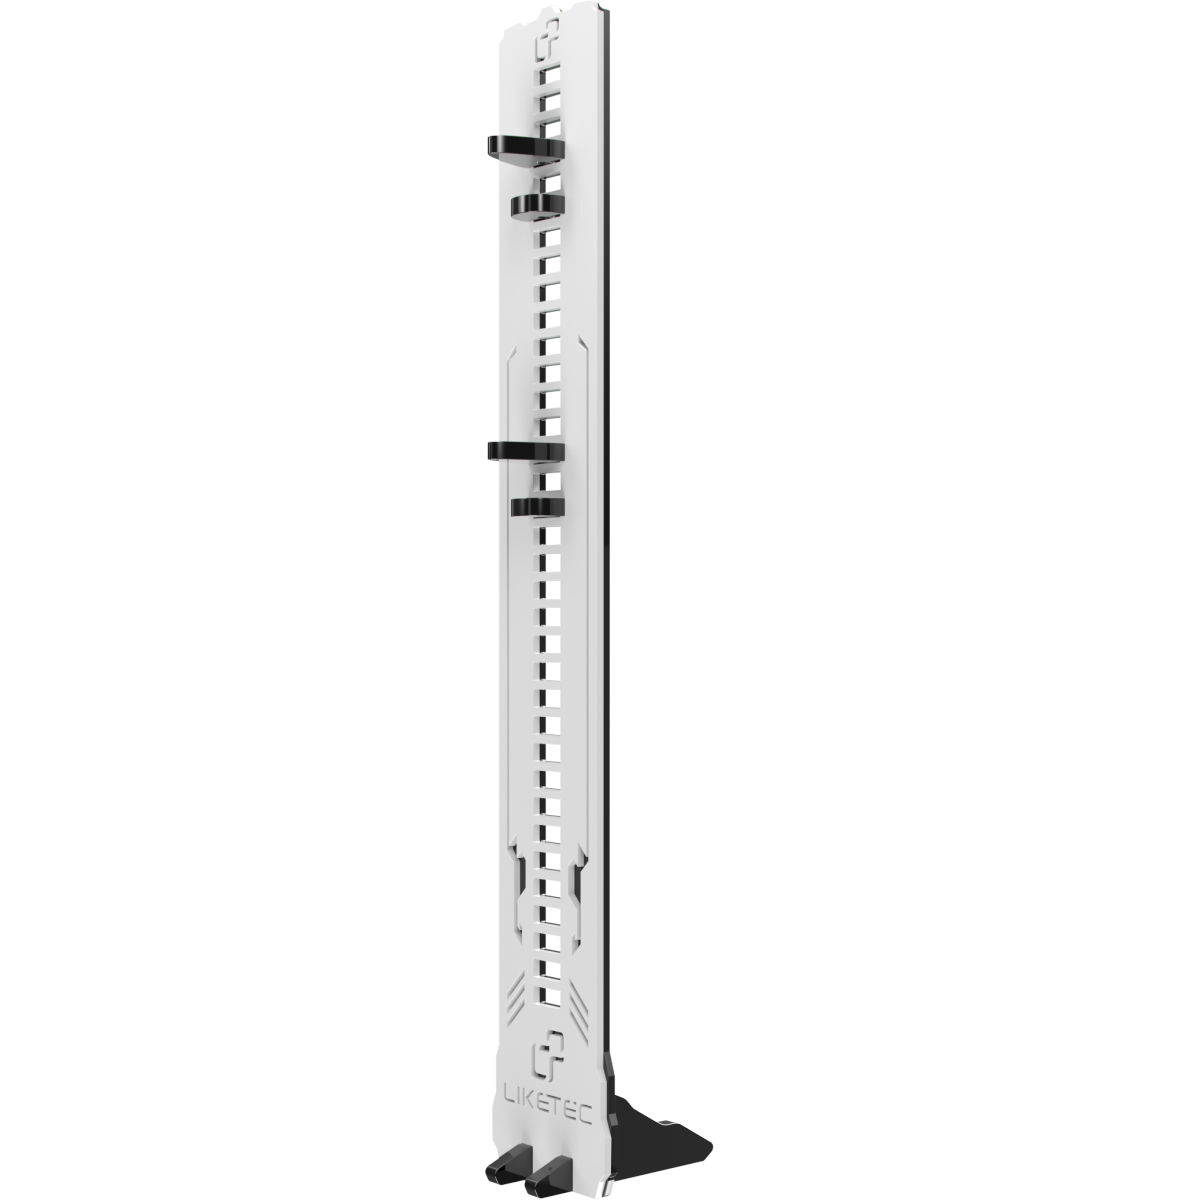 Suporte para Placa de Video Liketec Nexxus 2 Branco